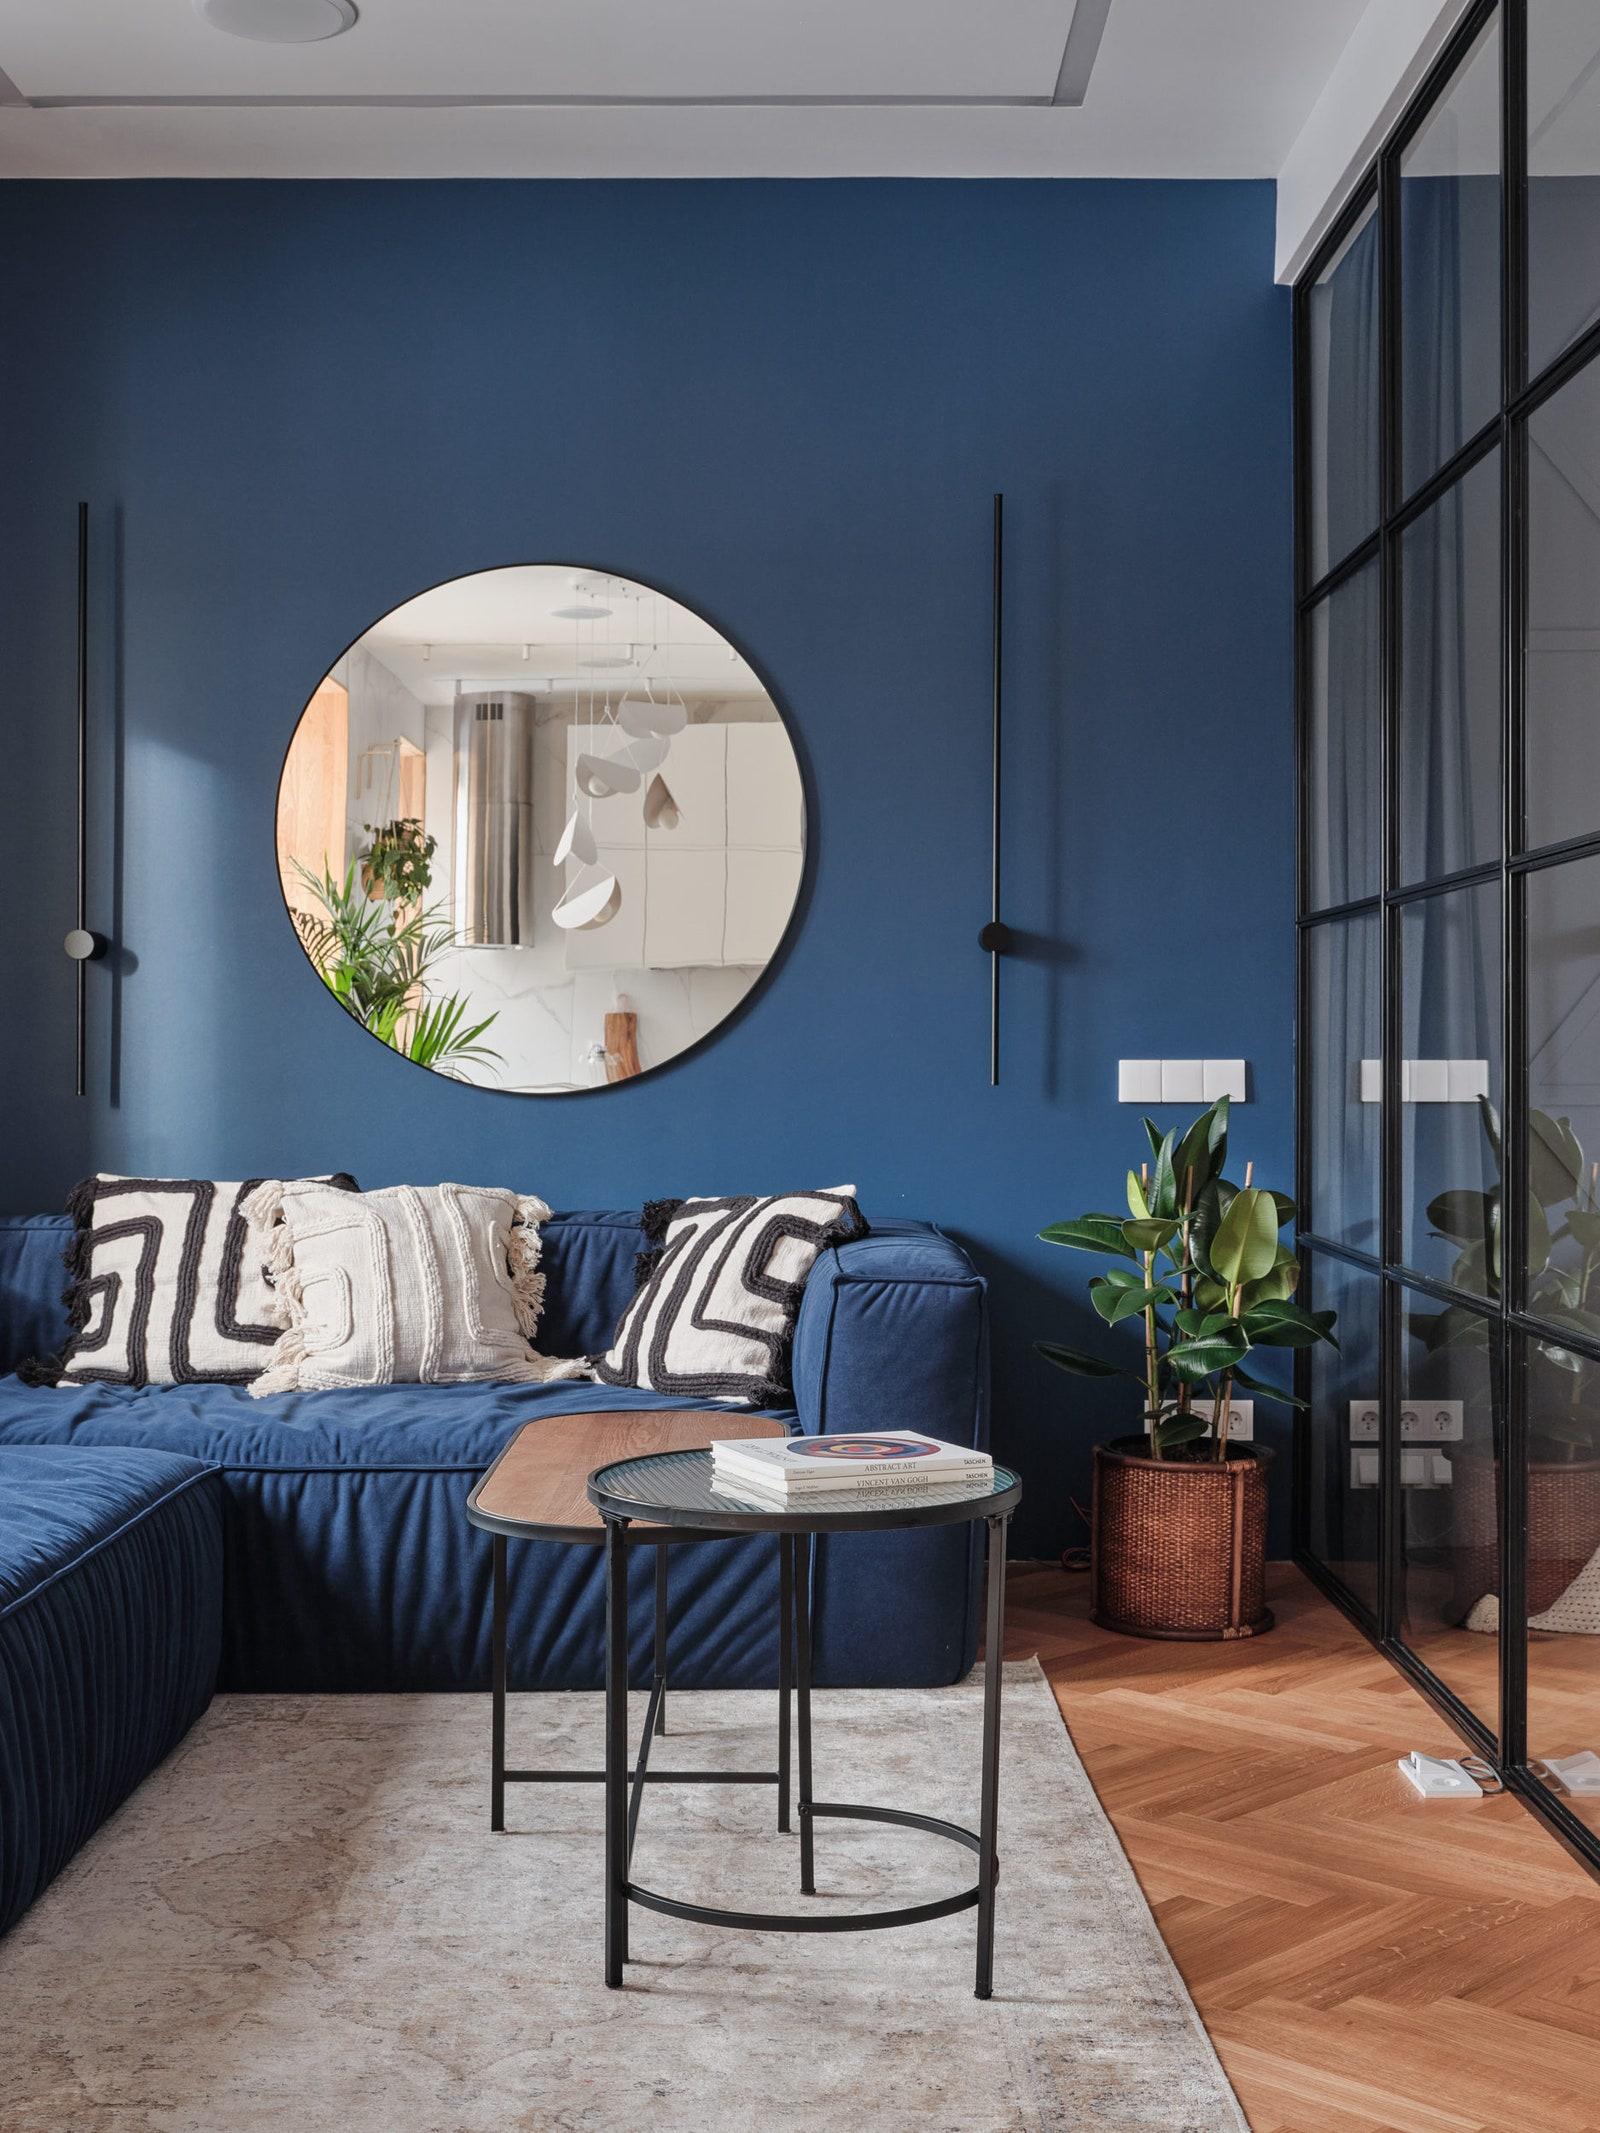 Chi Design.  .  Gliver   LoftDesigne  IKEA   Centrsvet    HampM Home  Arbellos  Zara Home.   .